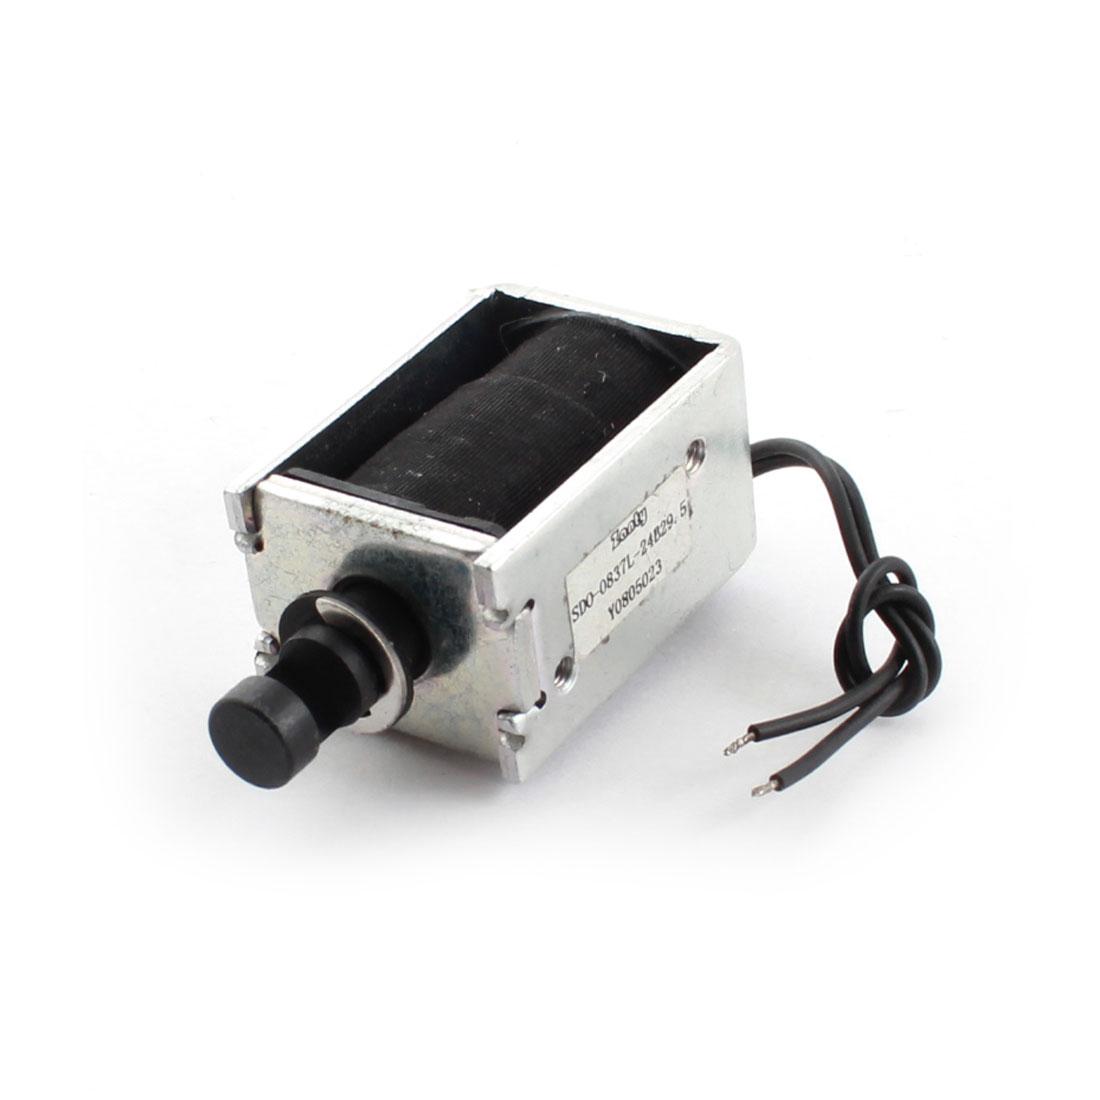 DC 24V 650g/6mm Open Frame Actuator Linear Pull Solenoid Electromagnet